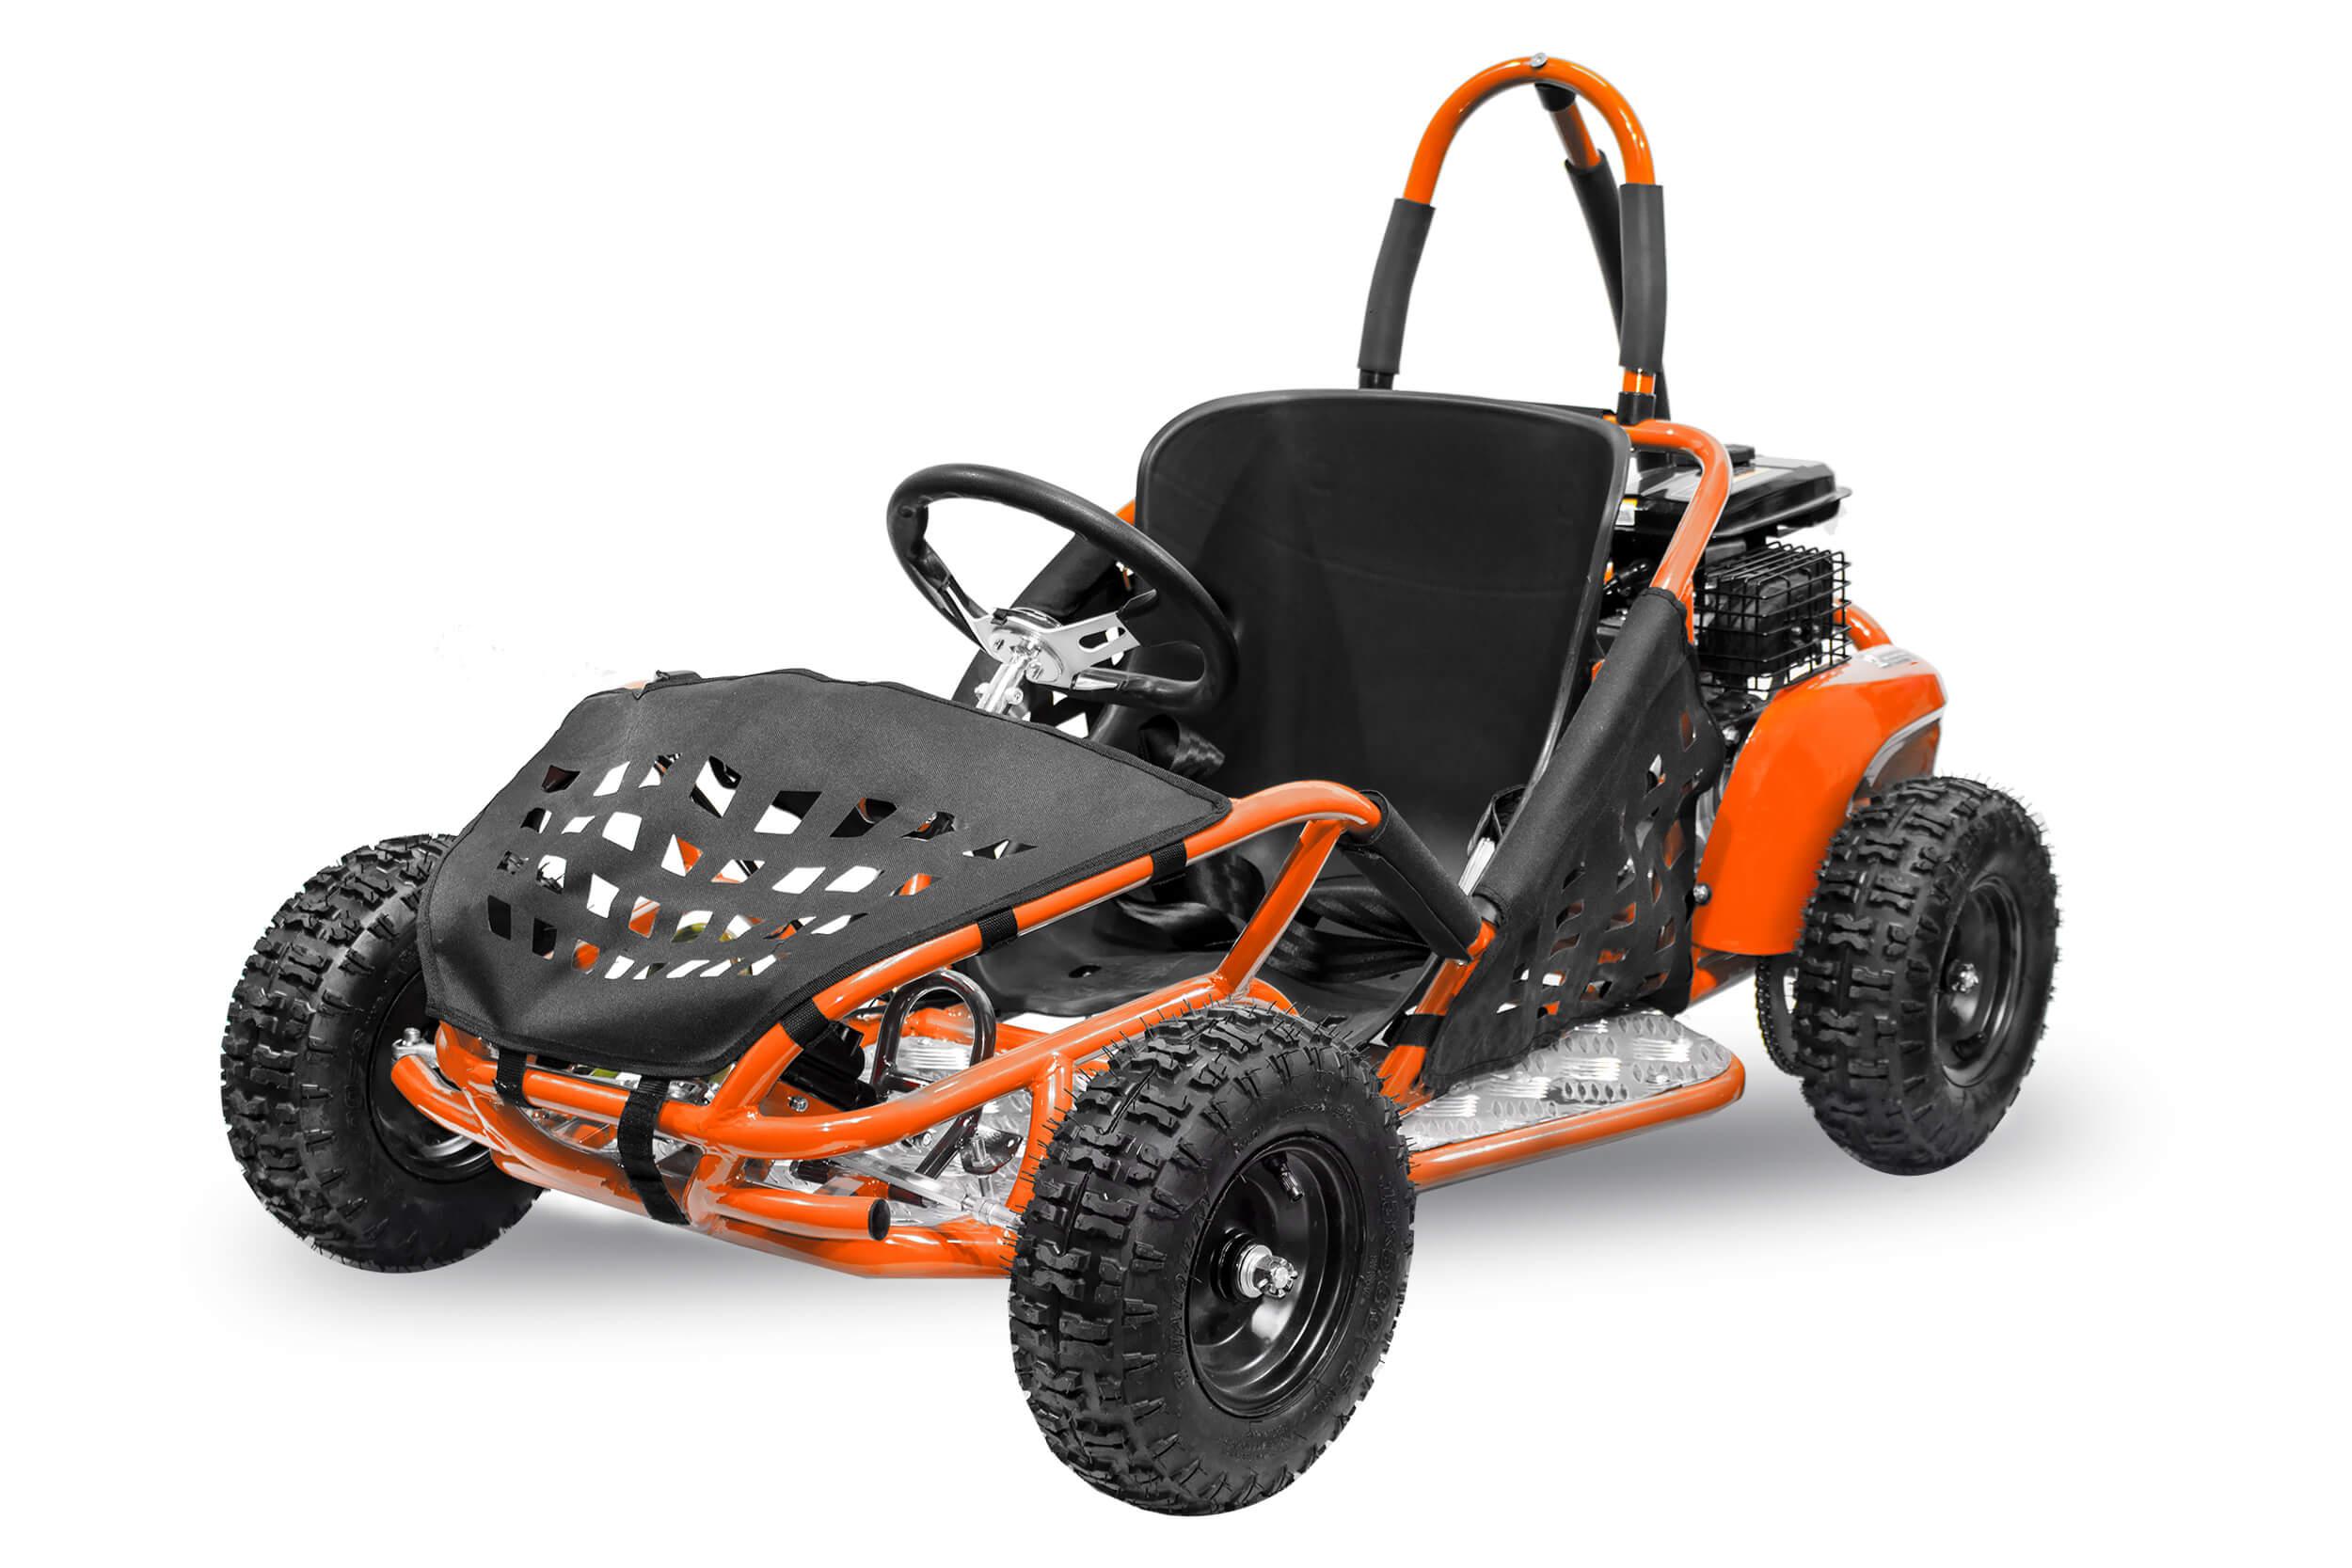 GoKid 80cc Buggy - 4 Stroke Engine - Automatic - 6 inch Wheels - Steel Frame